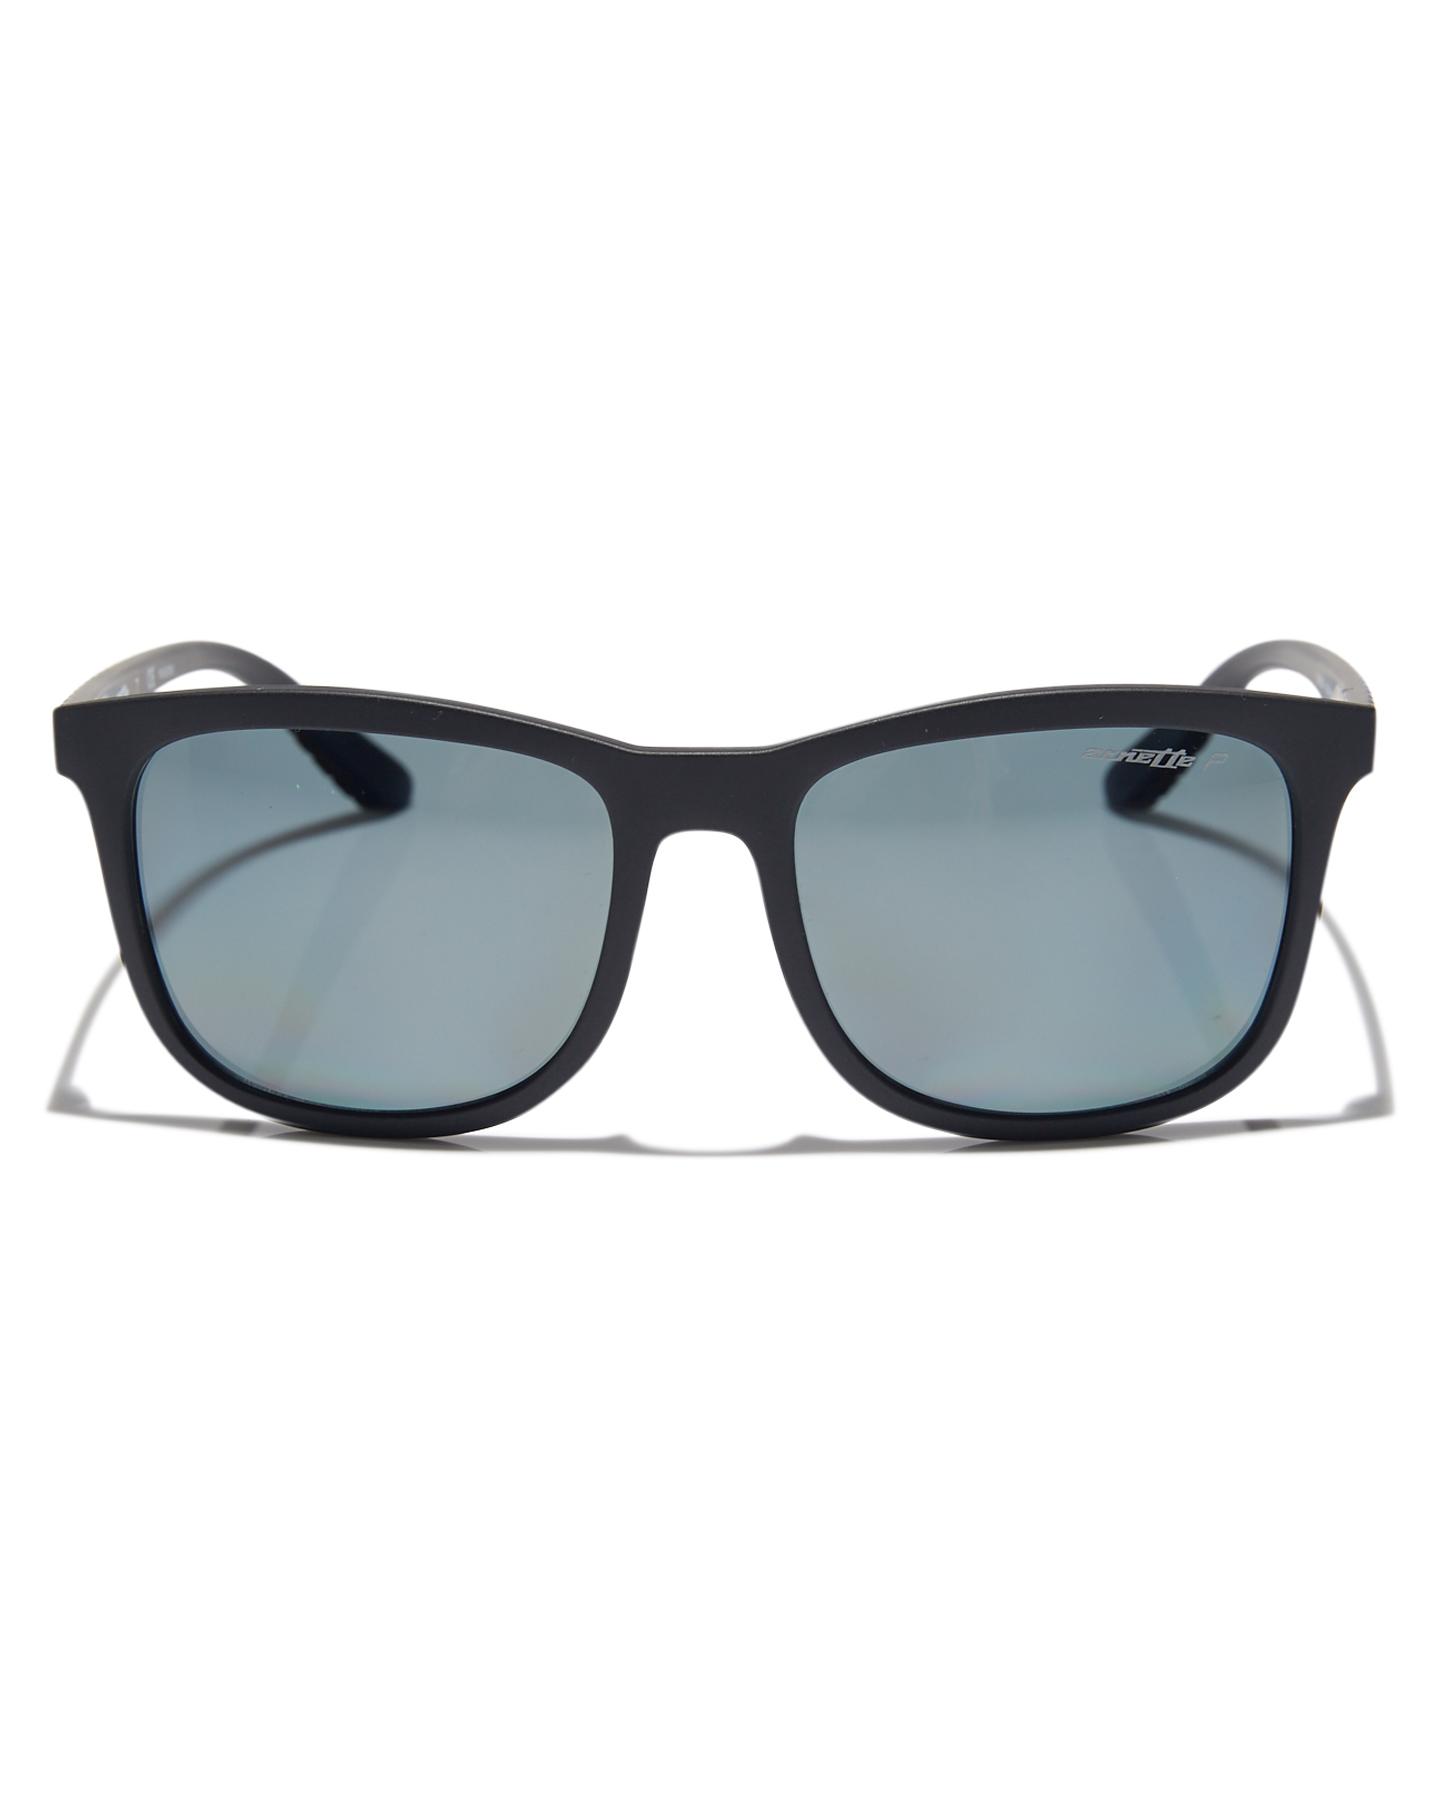 c4c344136c Arnette Chenga Sunglasses - Matte Black Grey